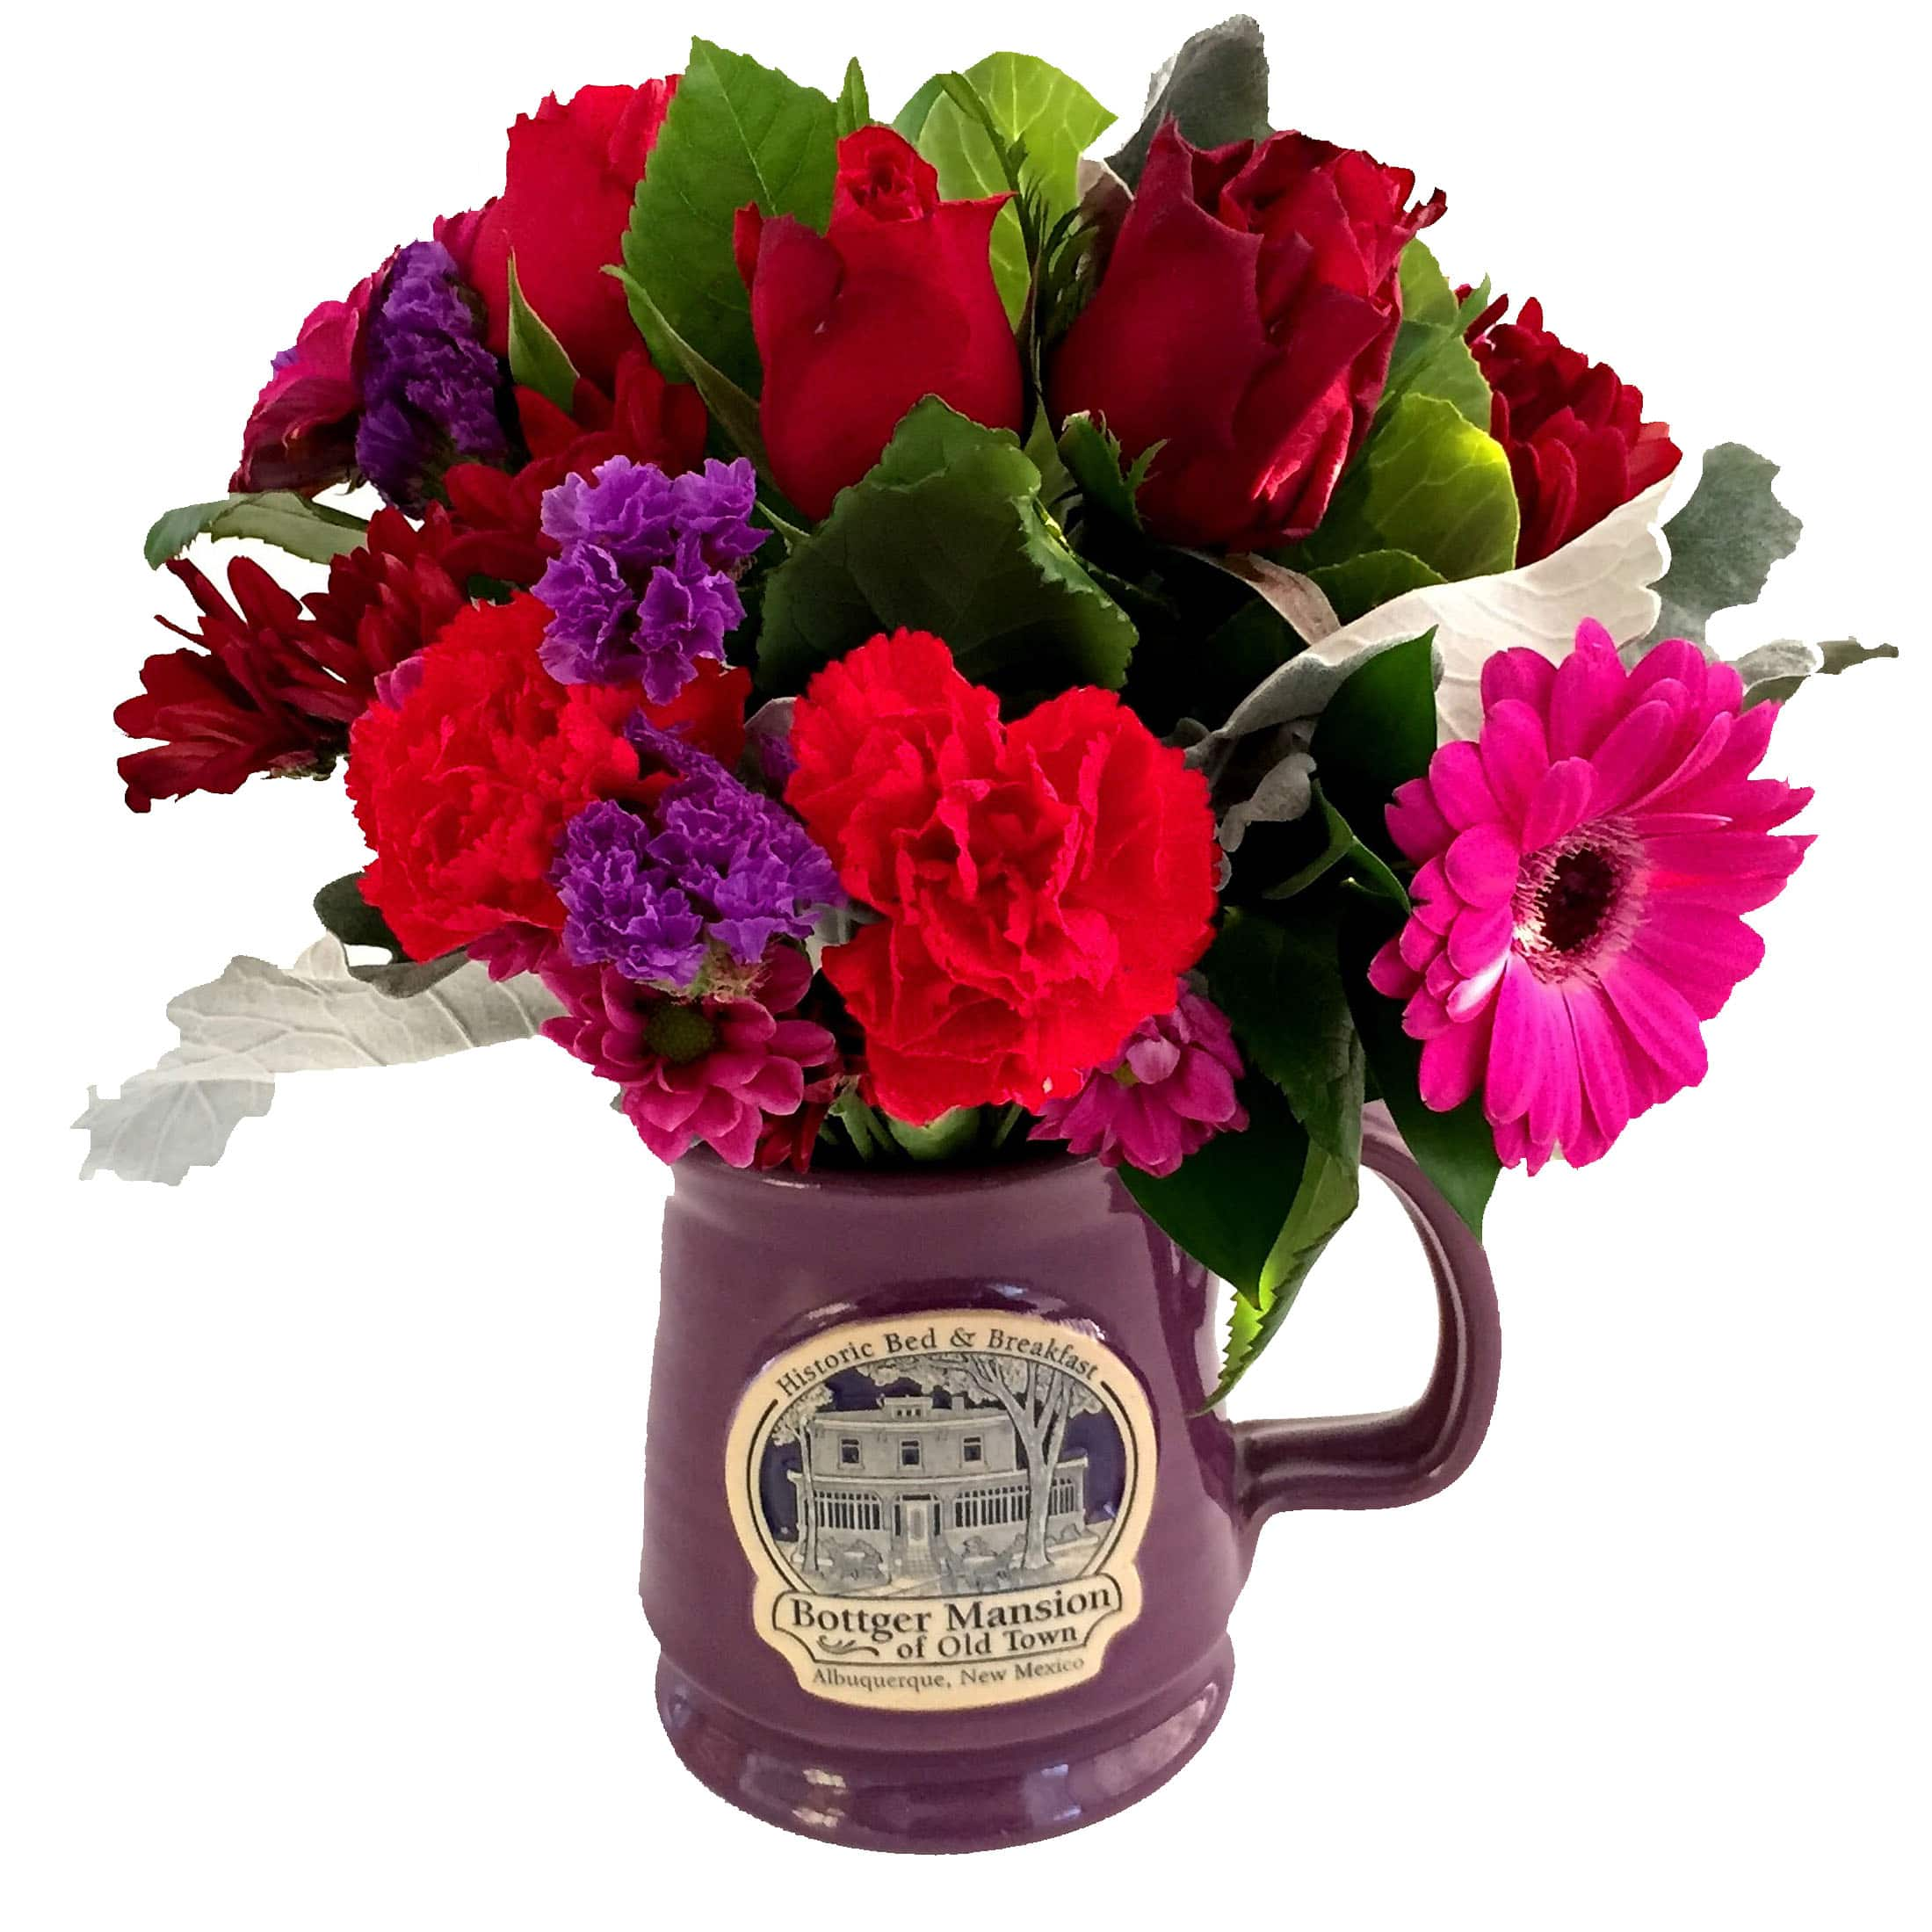 Flowers in flower vase